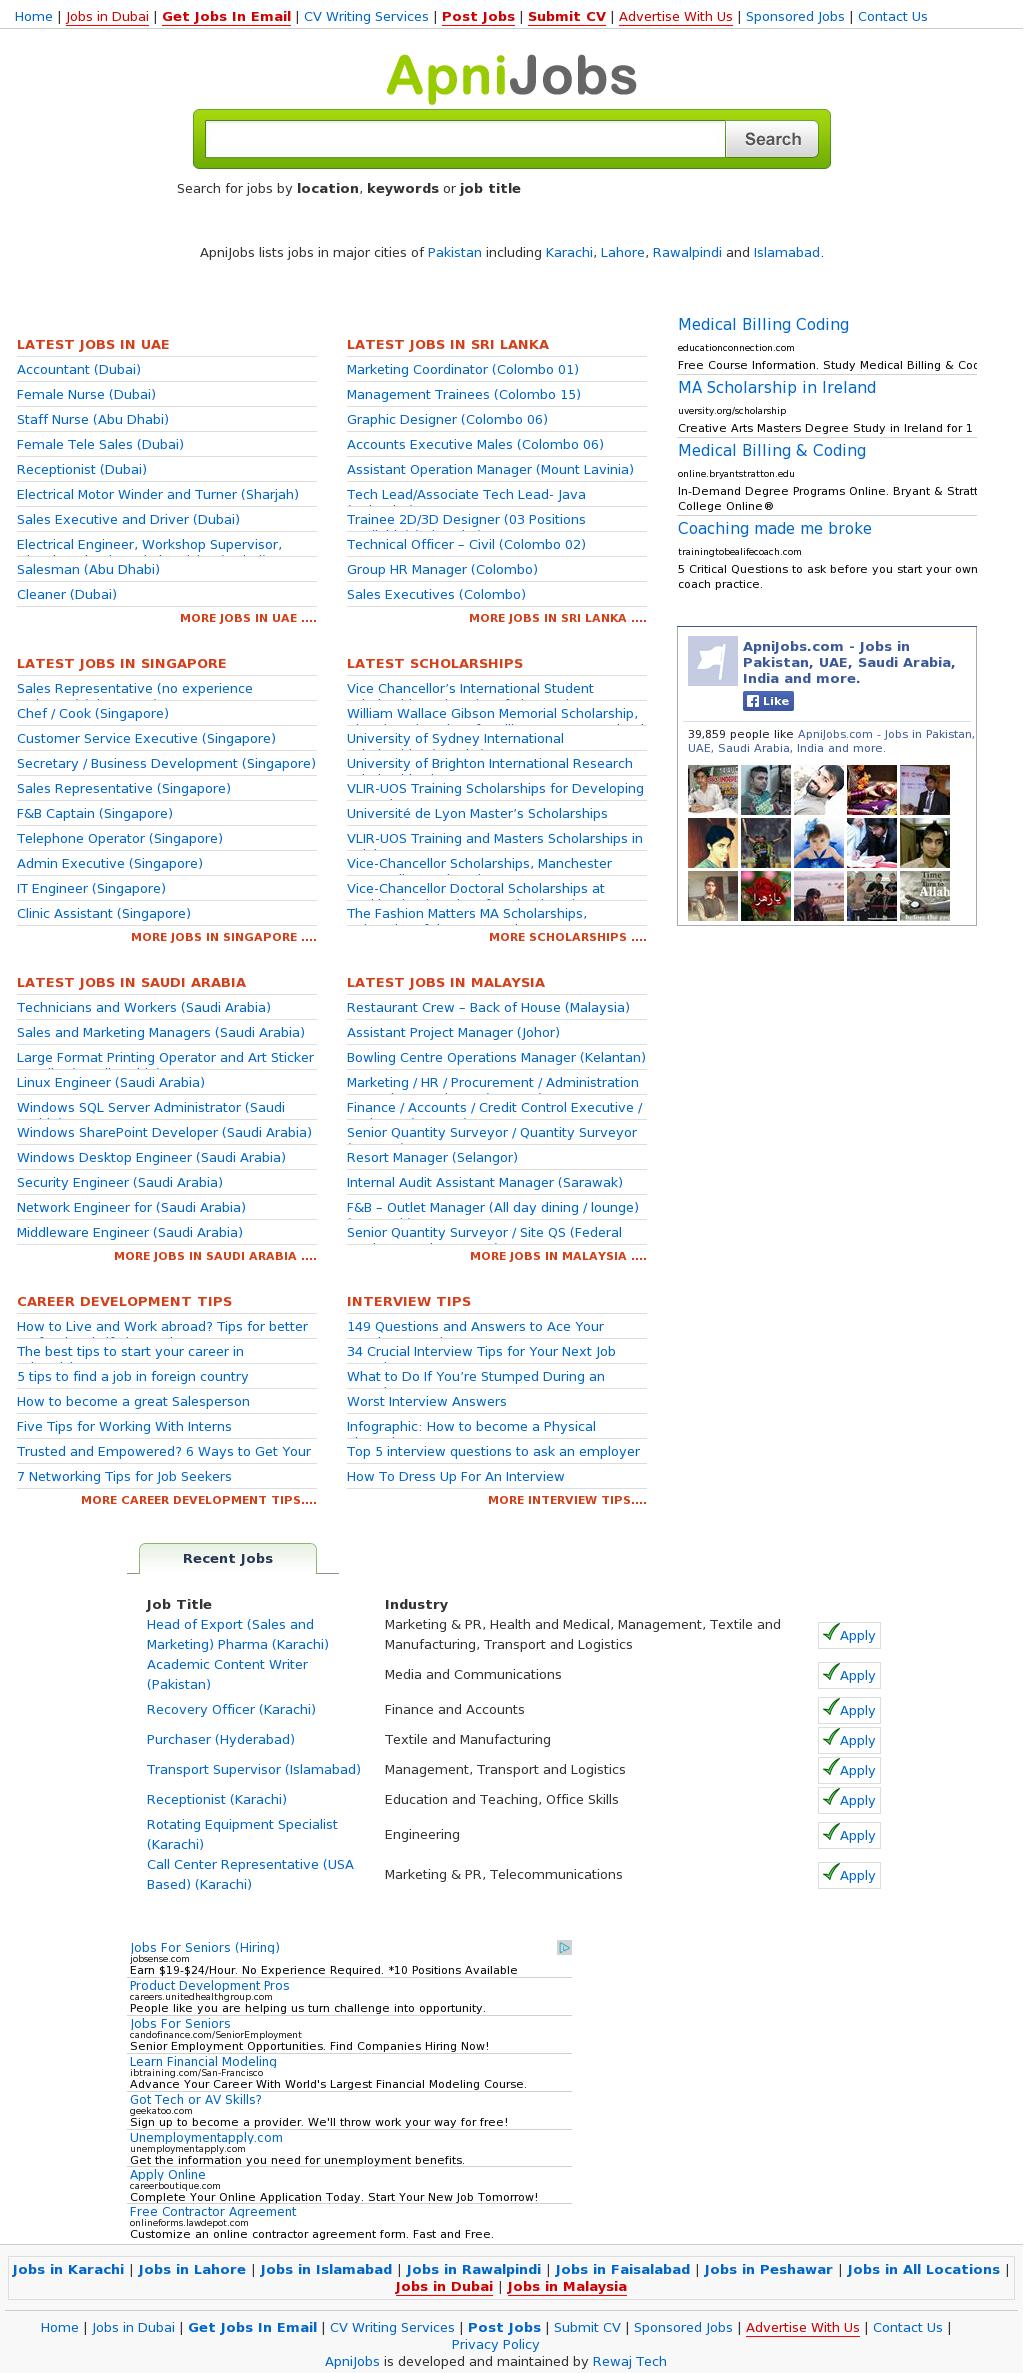 Apnijobs com - Jobs In Pakistan, Uae, Saudi Arabia, India